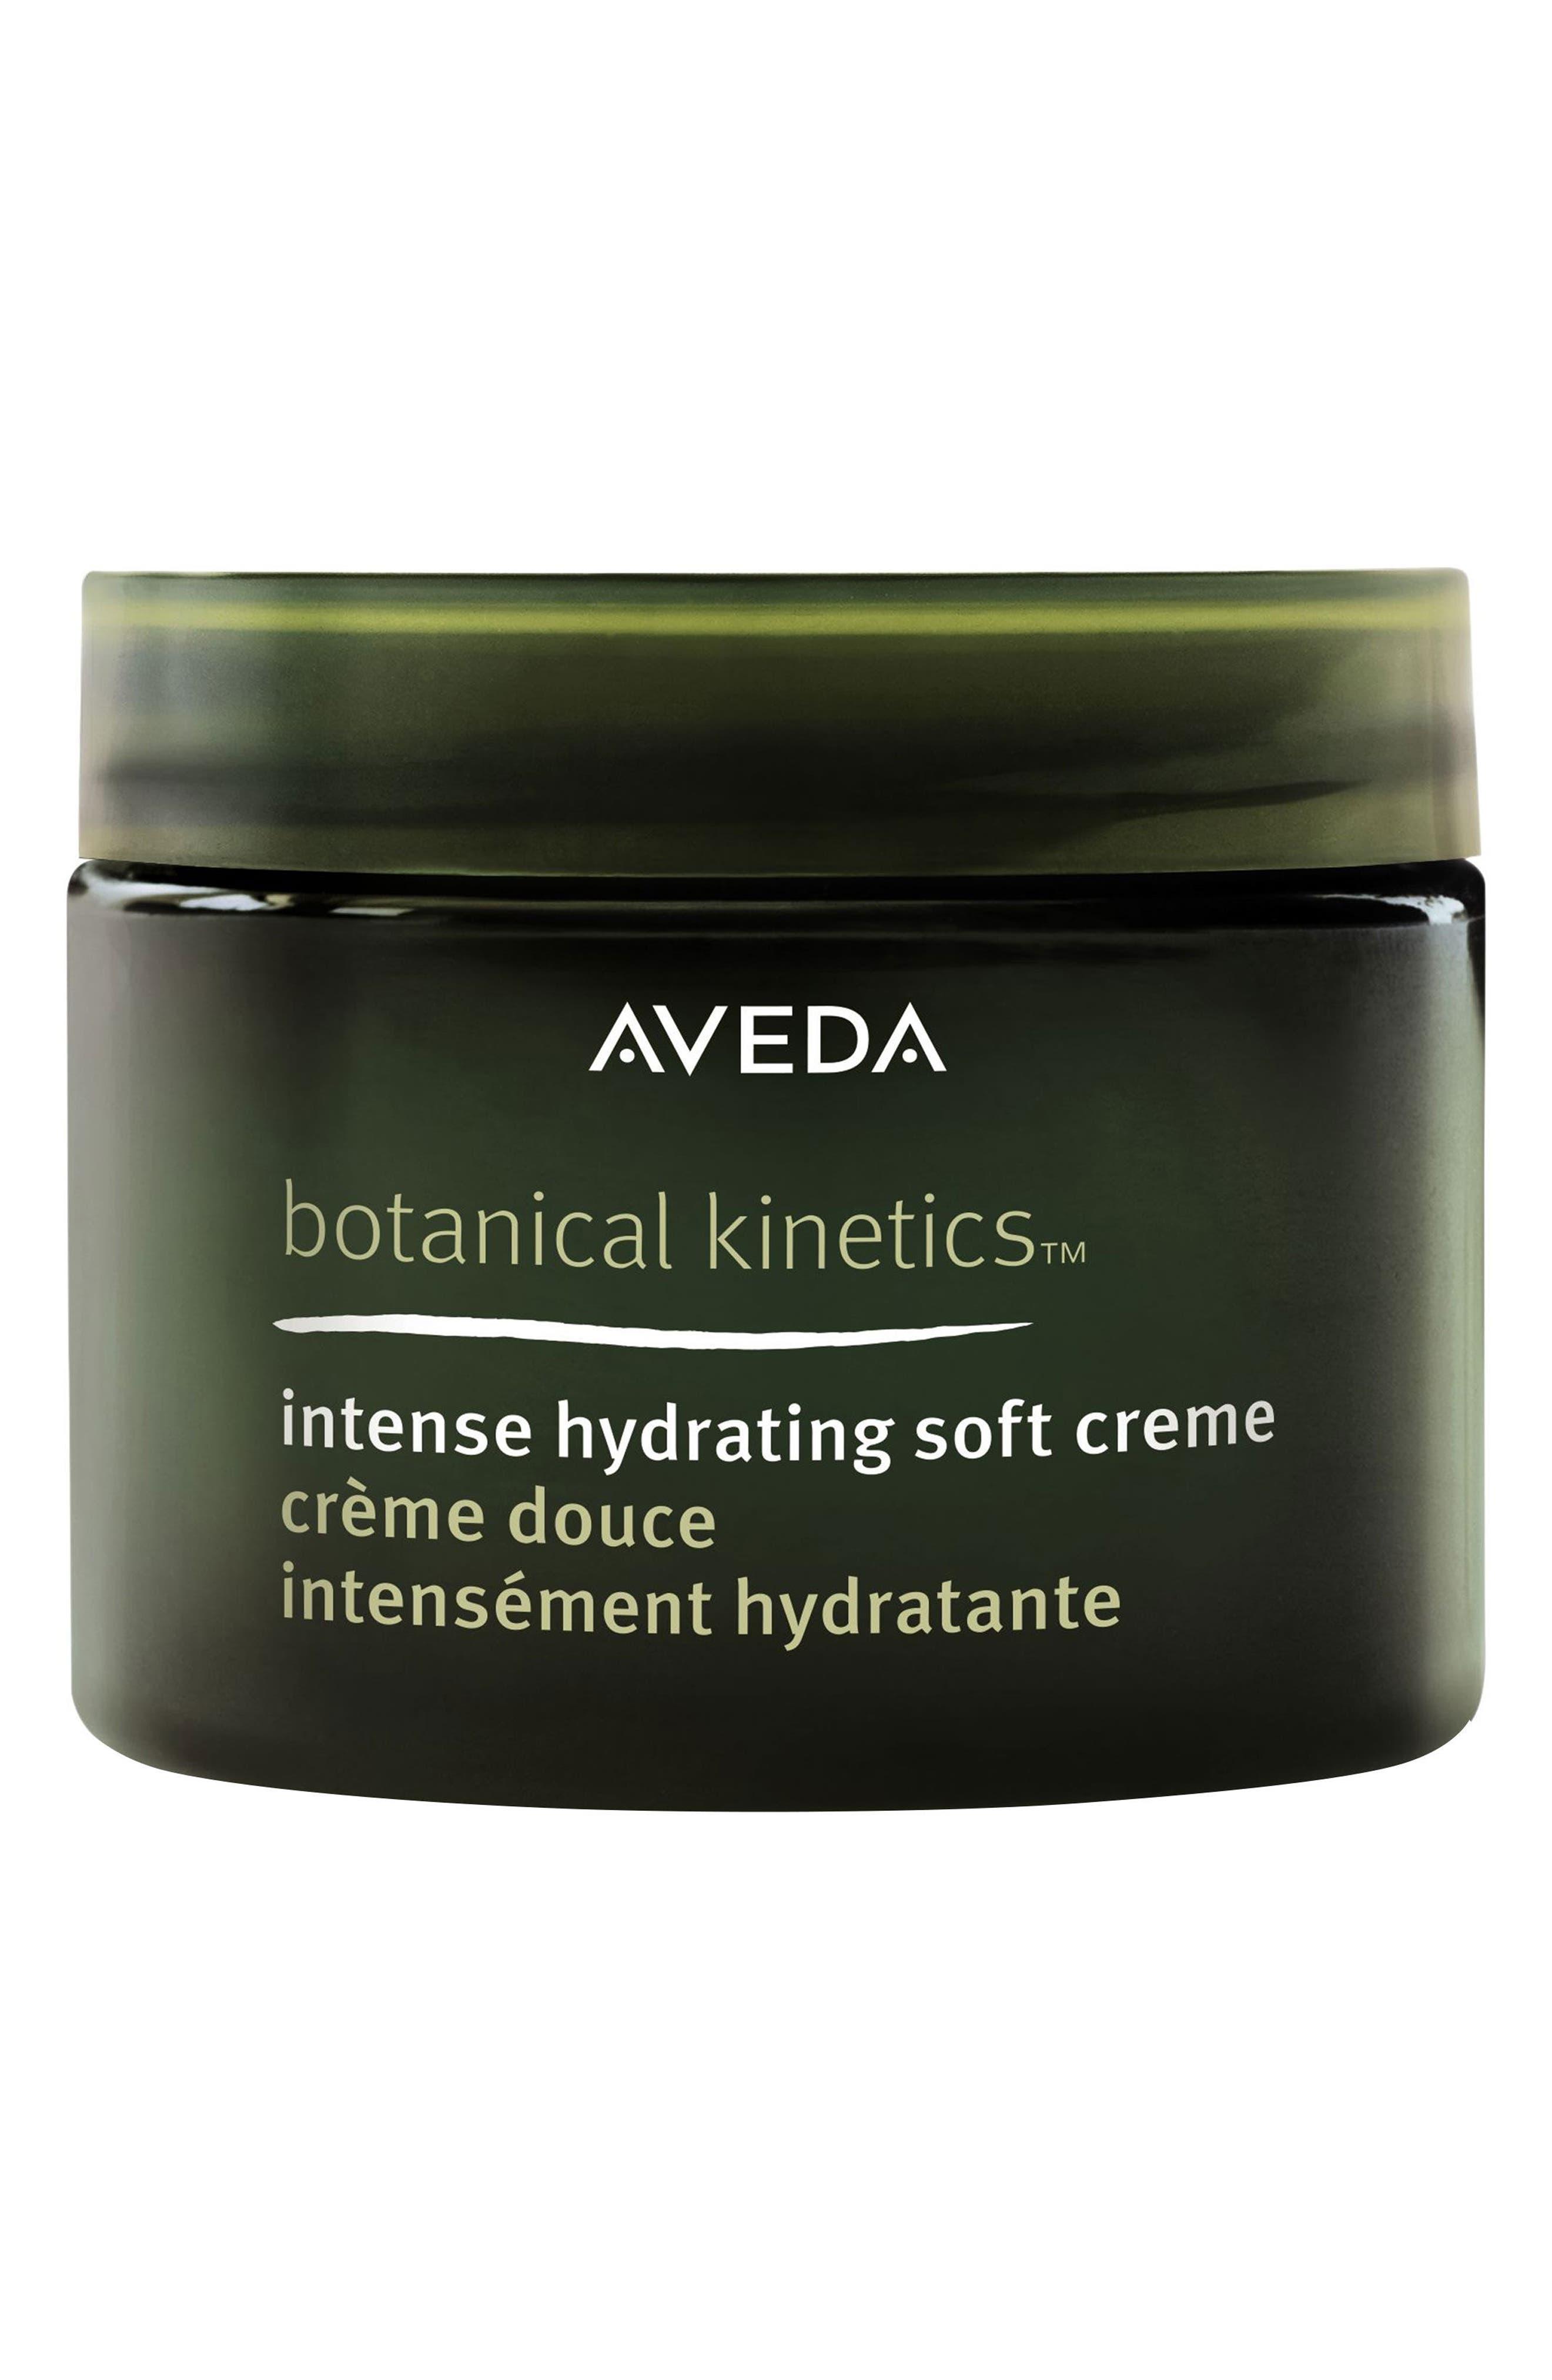 Main Image - Aveda 'botanical kinetics™' Intense Hydrating Soft Crème